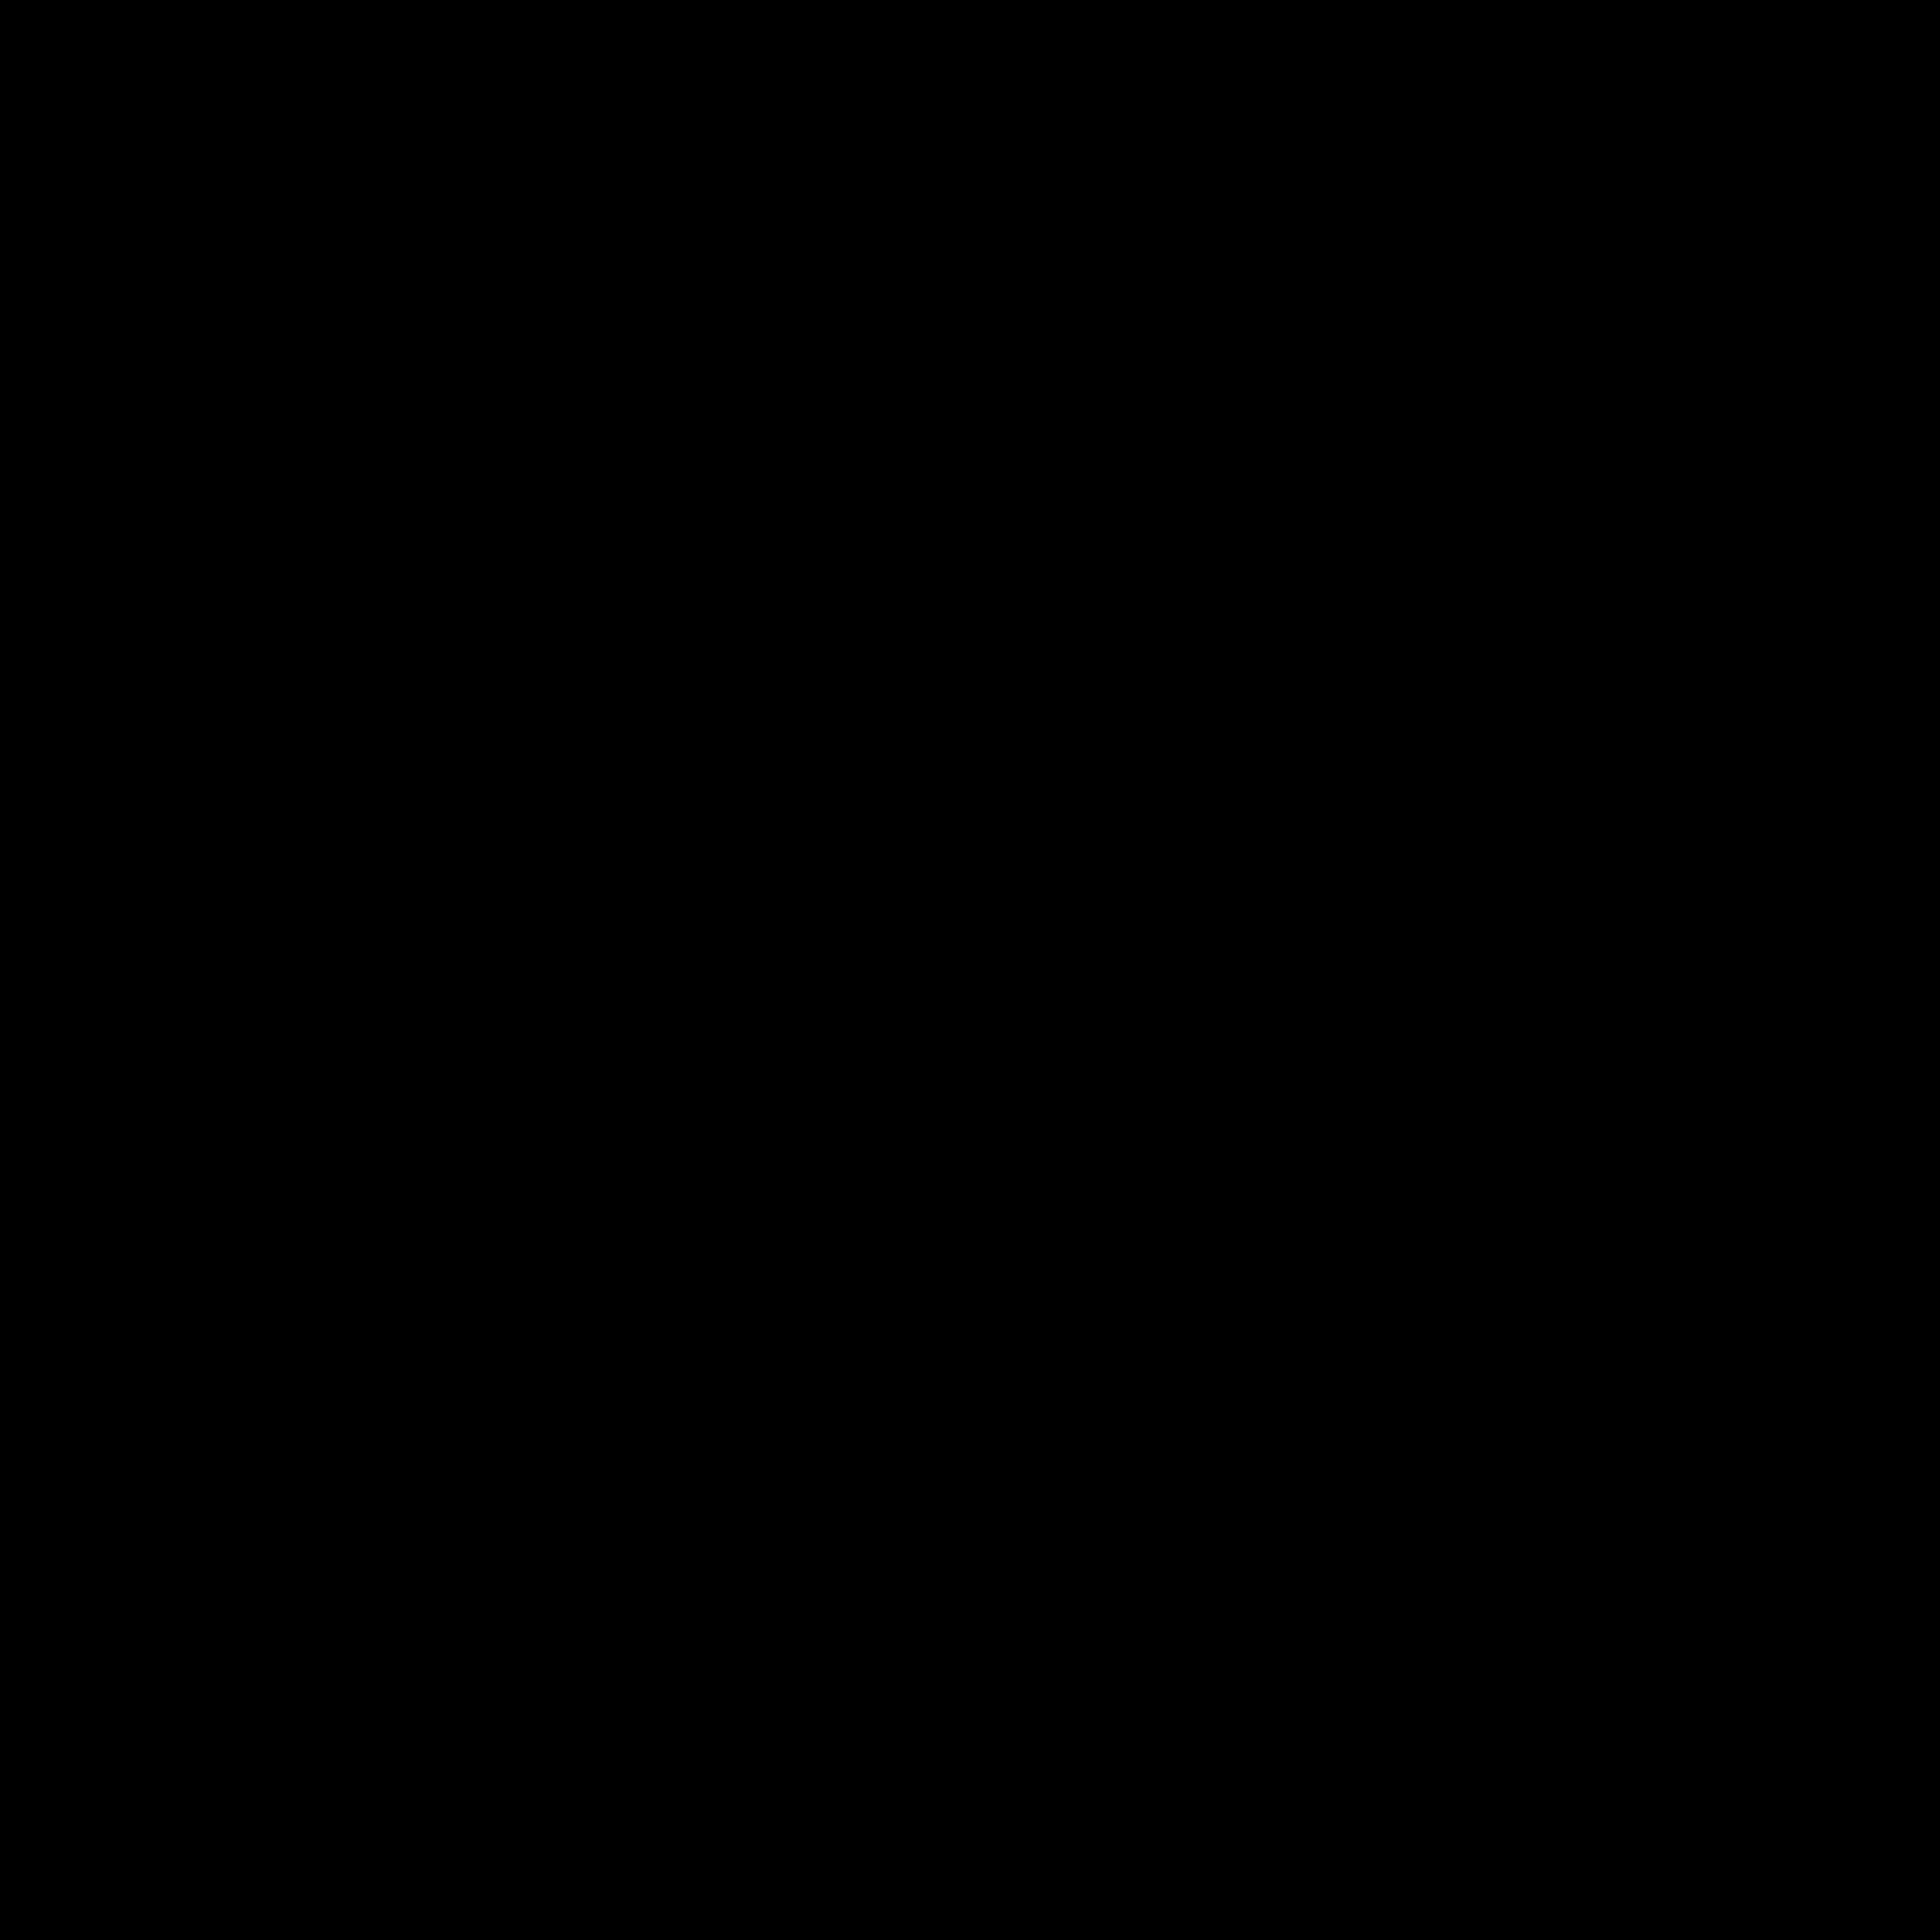 path, black icon